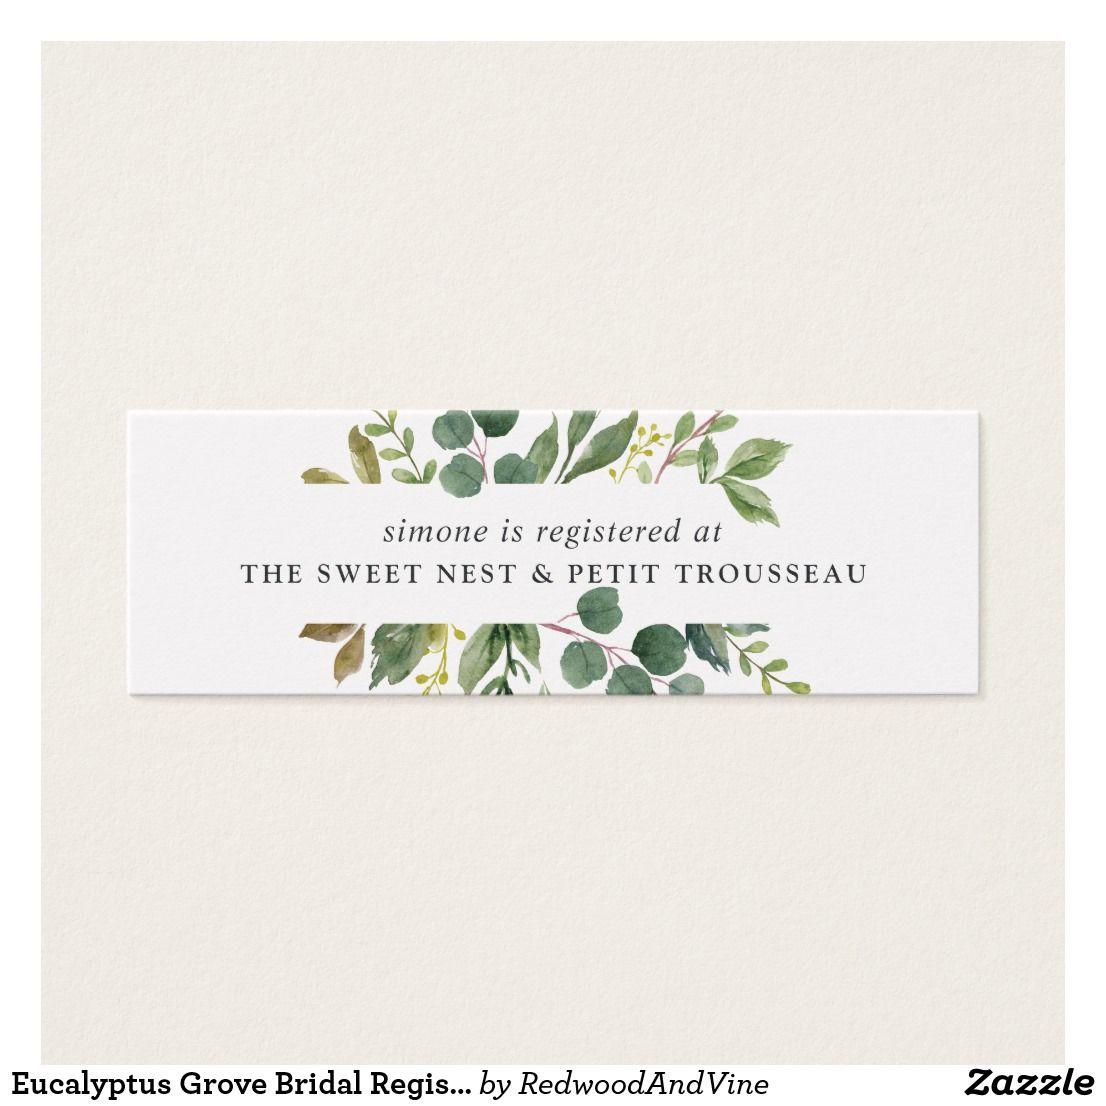 Destination Wedding Gift Etiquette: Eucalyptus Grove Bridal Registry Insert Cards